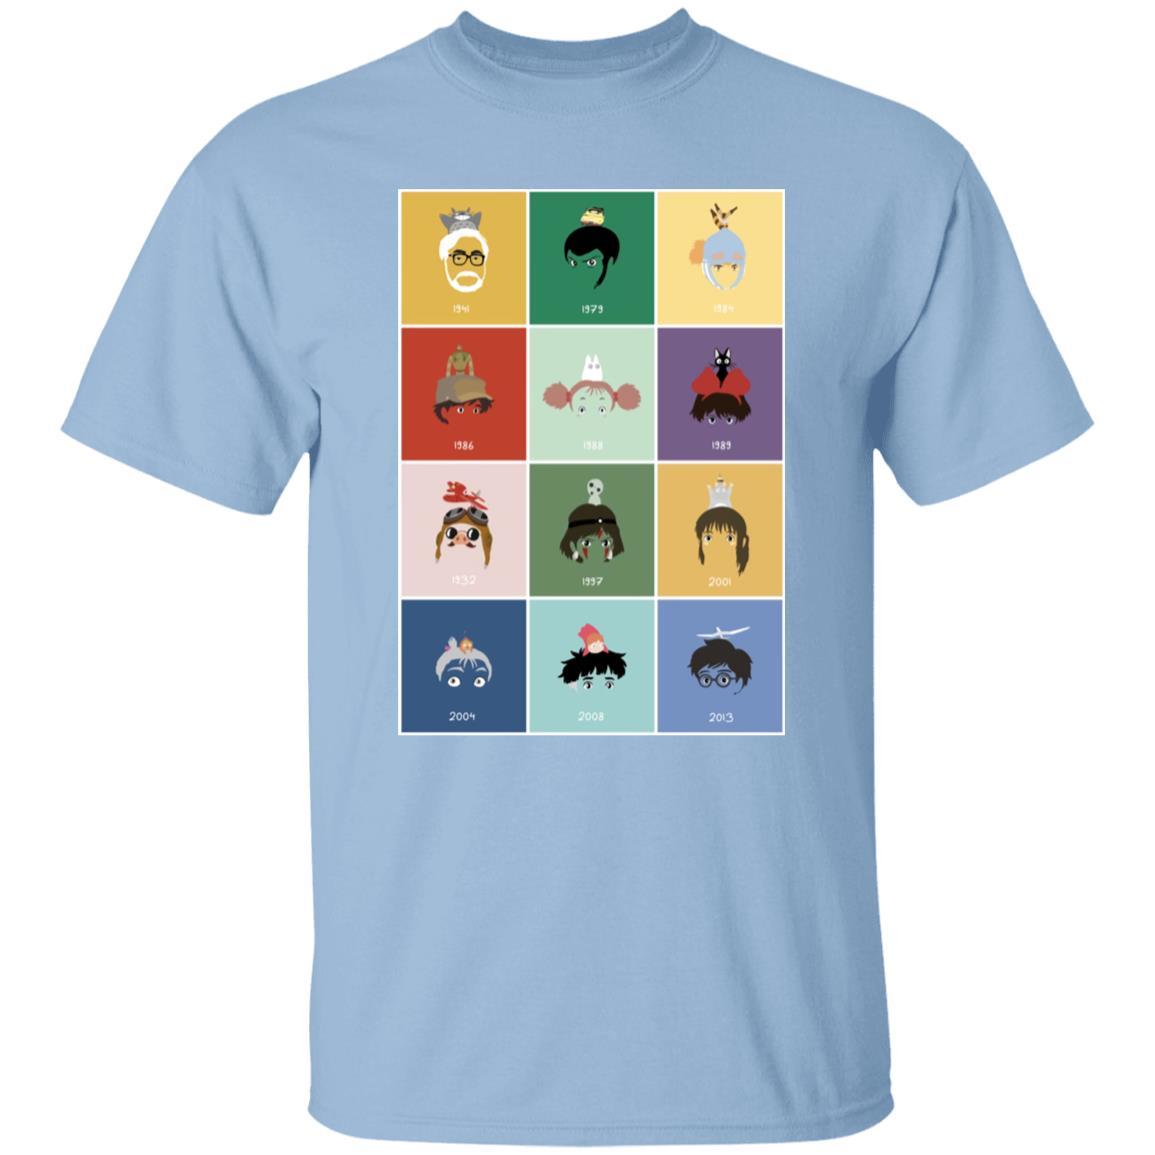 Ghibli Movie Collection T Shirt